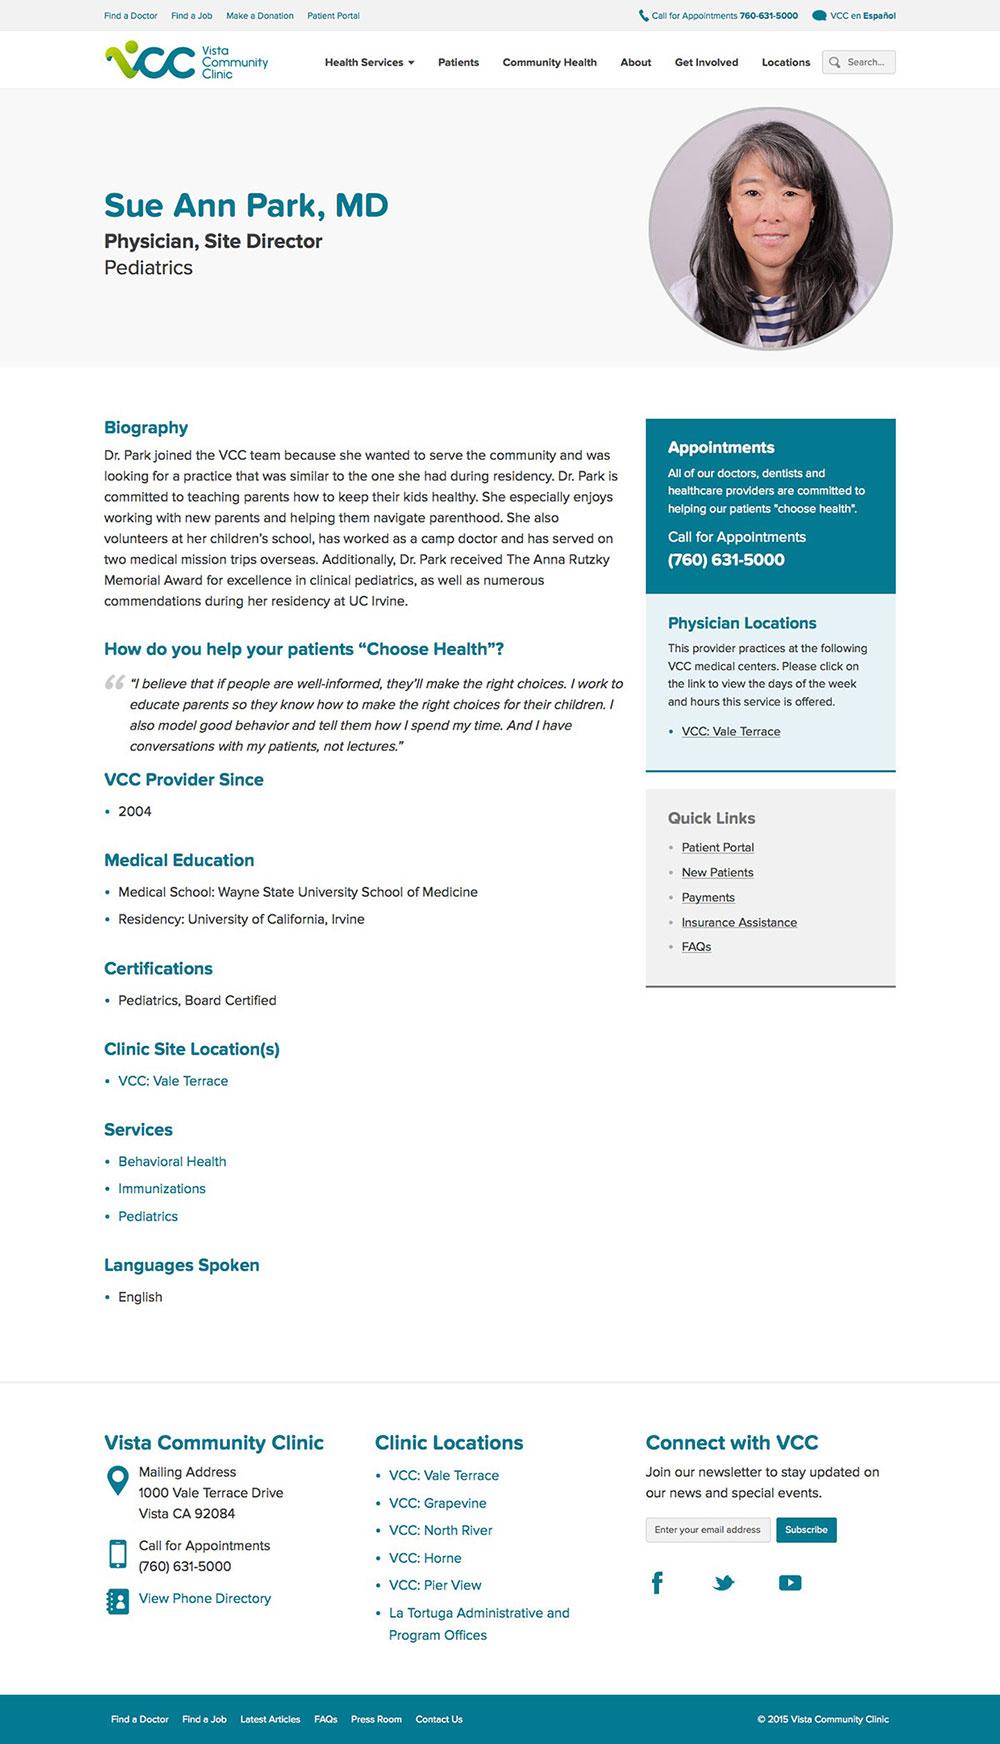 ignyte-web-design-agency-vista-community-clinic-doctor-1000